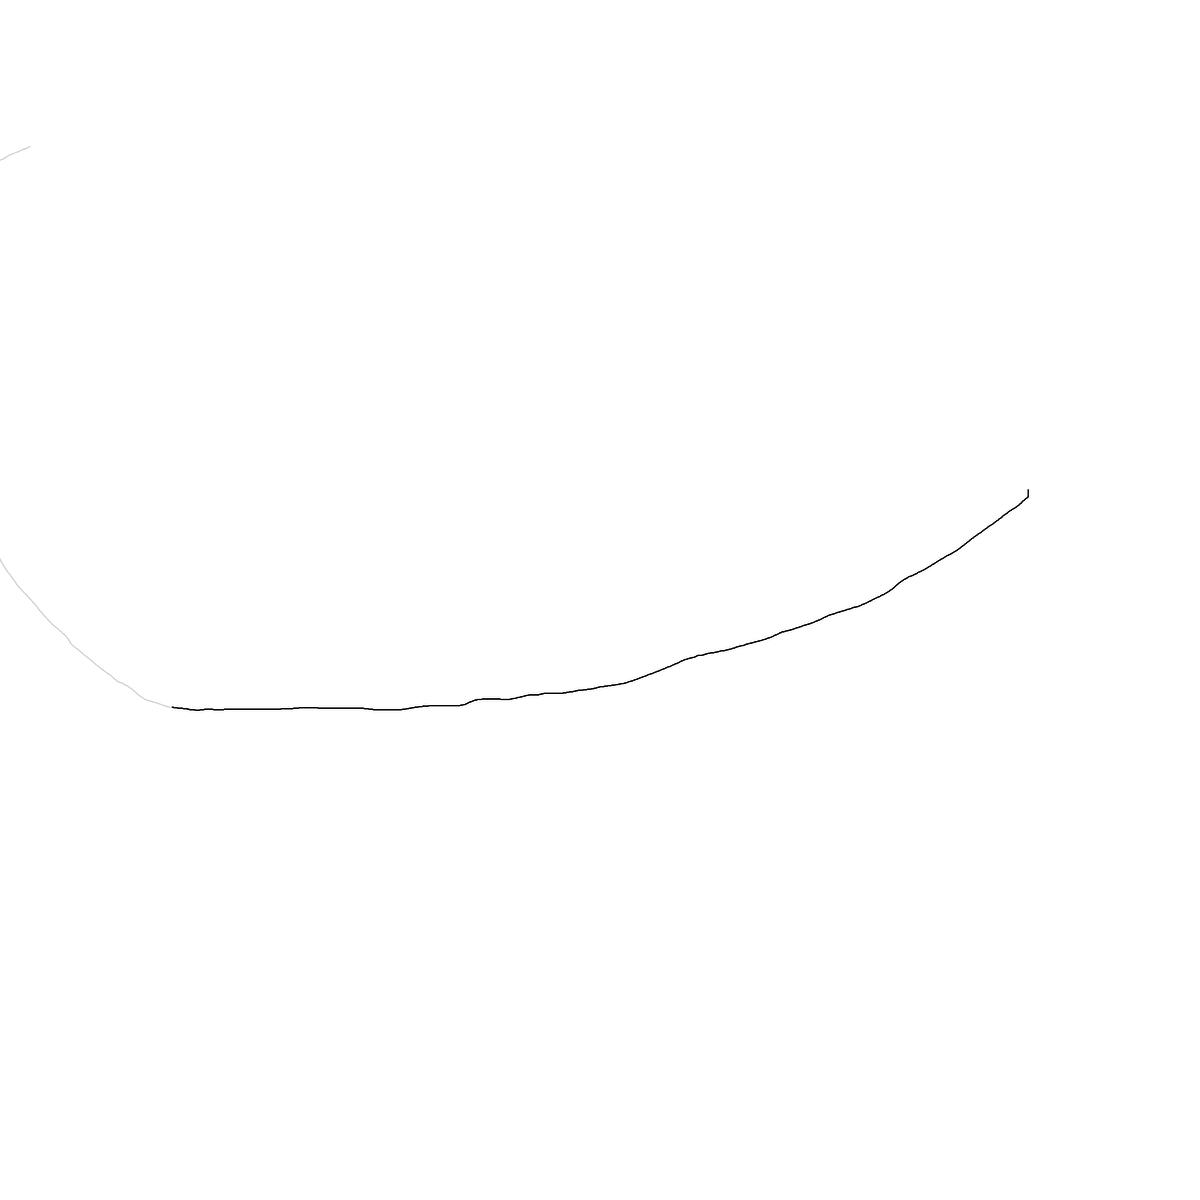 BAAAM drawing#16073 lat:39.0970993041992200lng: -84.5065307617187500